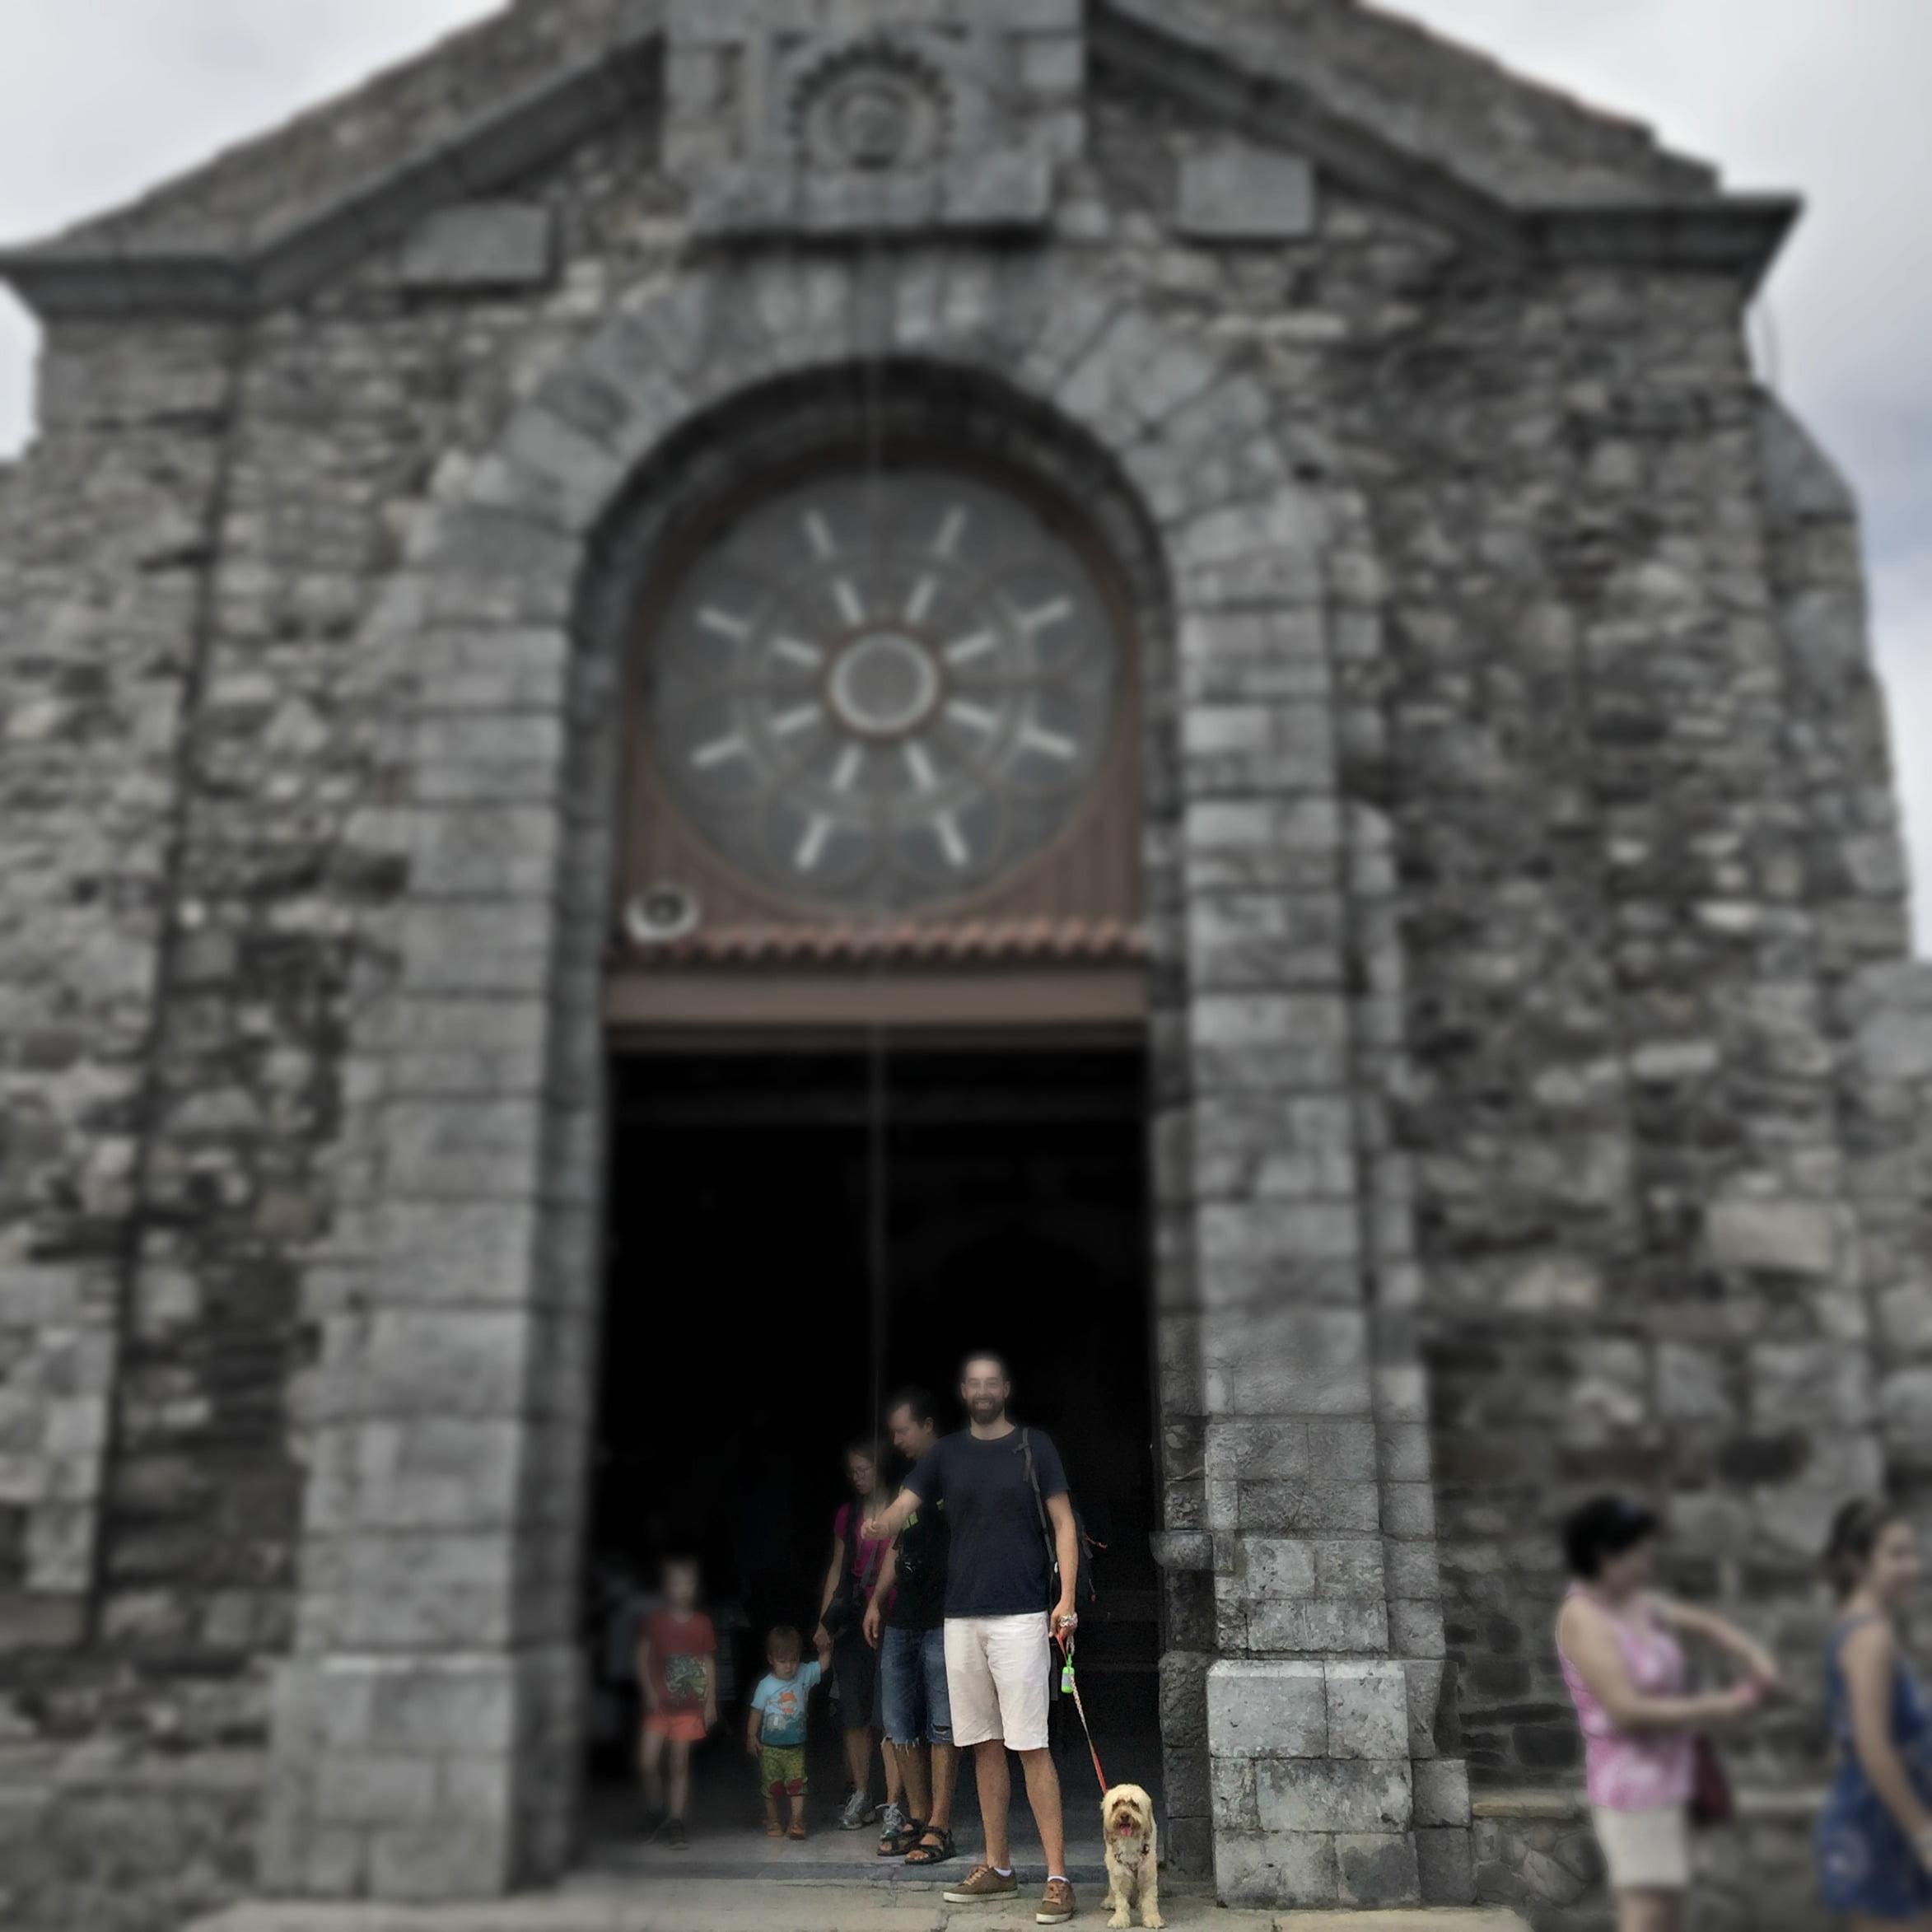 excursión con perro a la ermita de San Juan de Gaztegalutxe